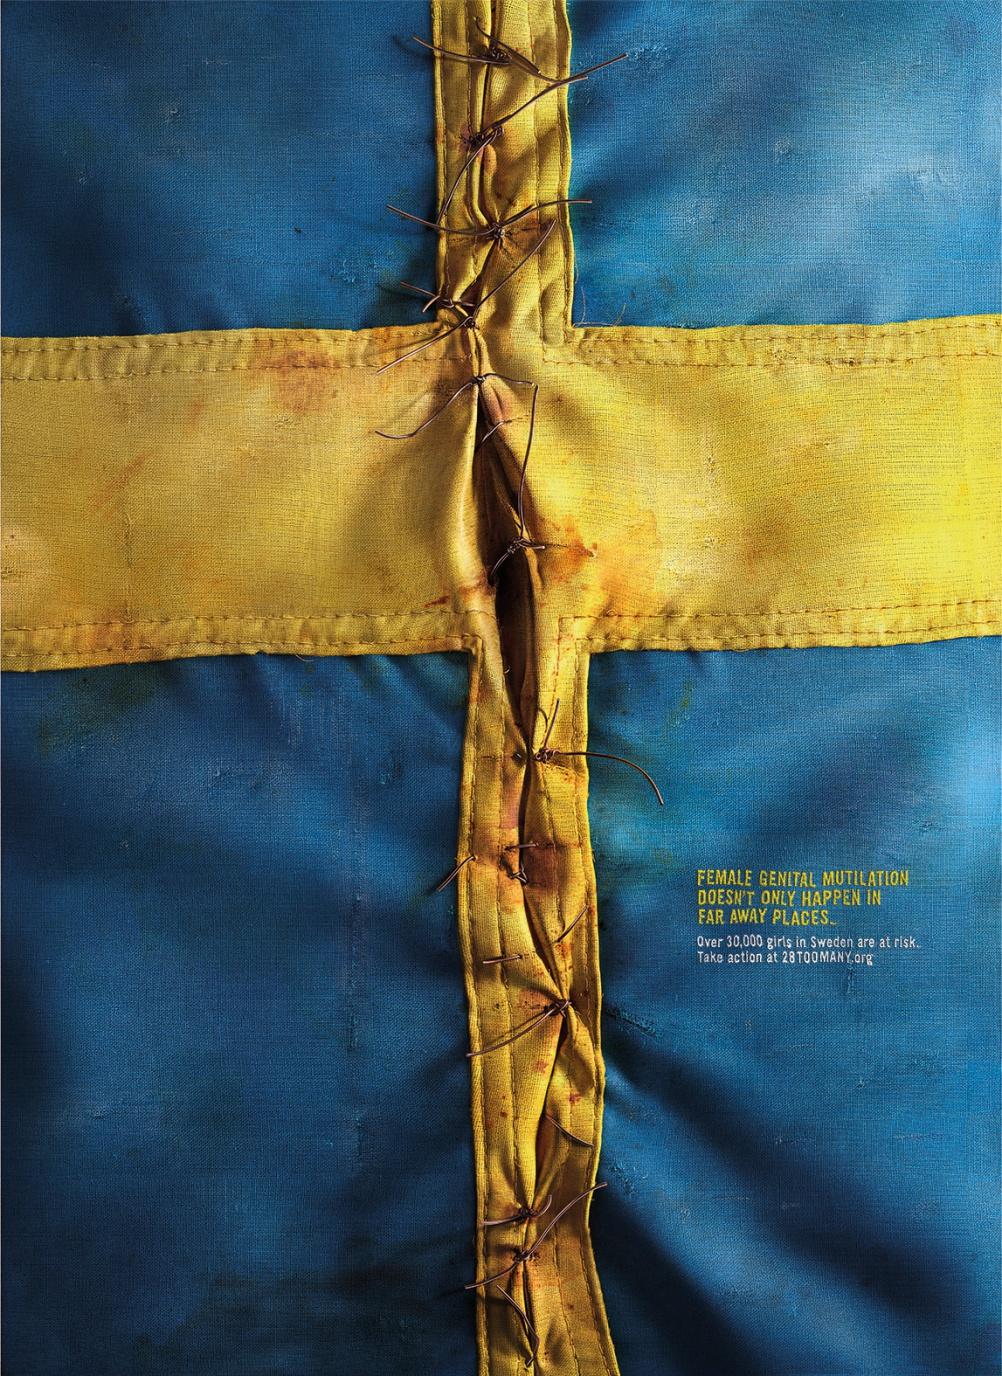 It Happens Here campaign - Swedish flag